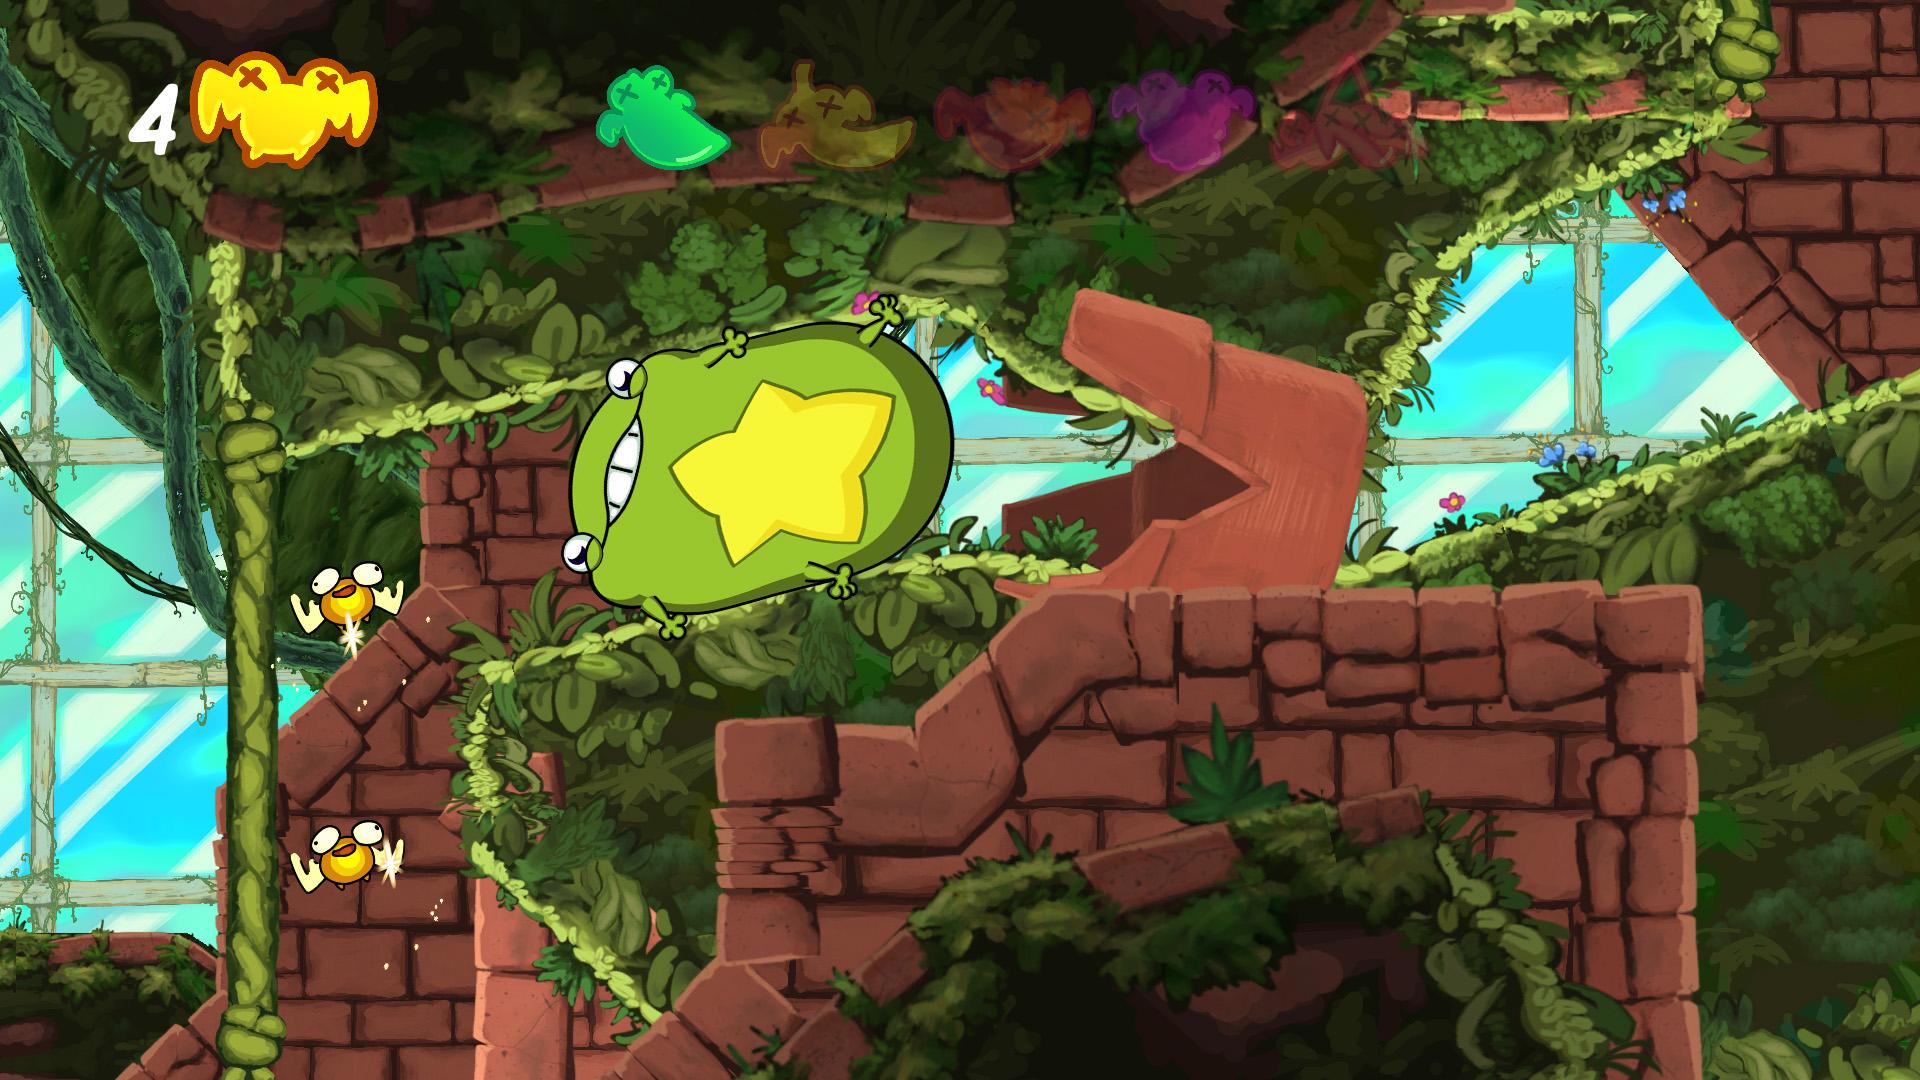 Pump the Frog screen_1920x1080_2018-11-22_11-33-26.jpg